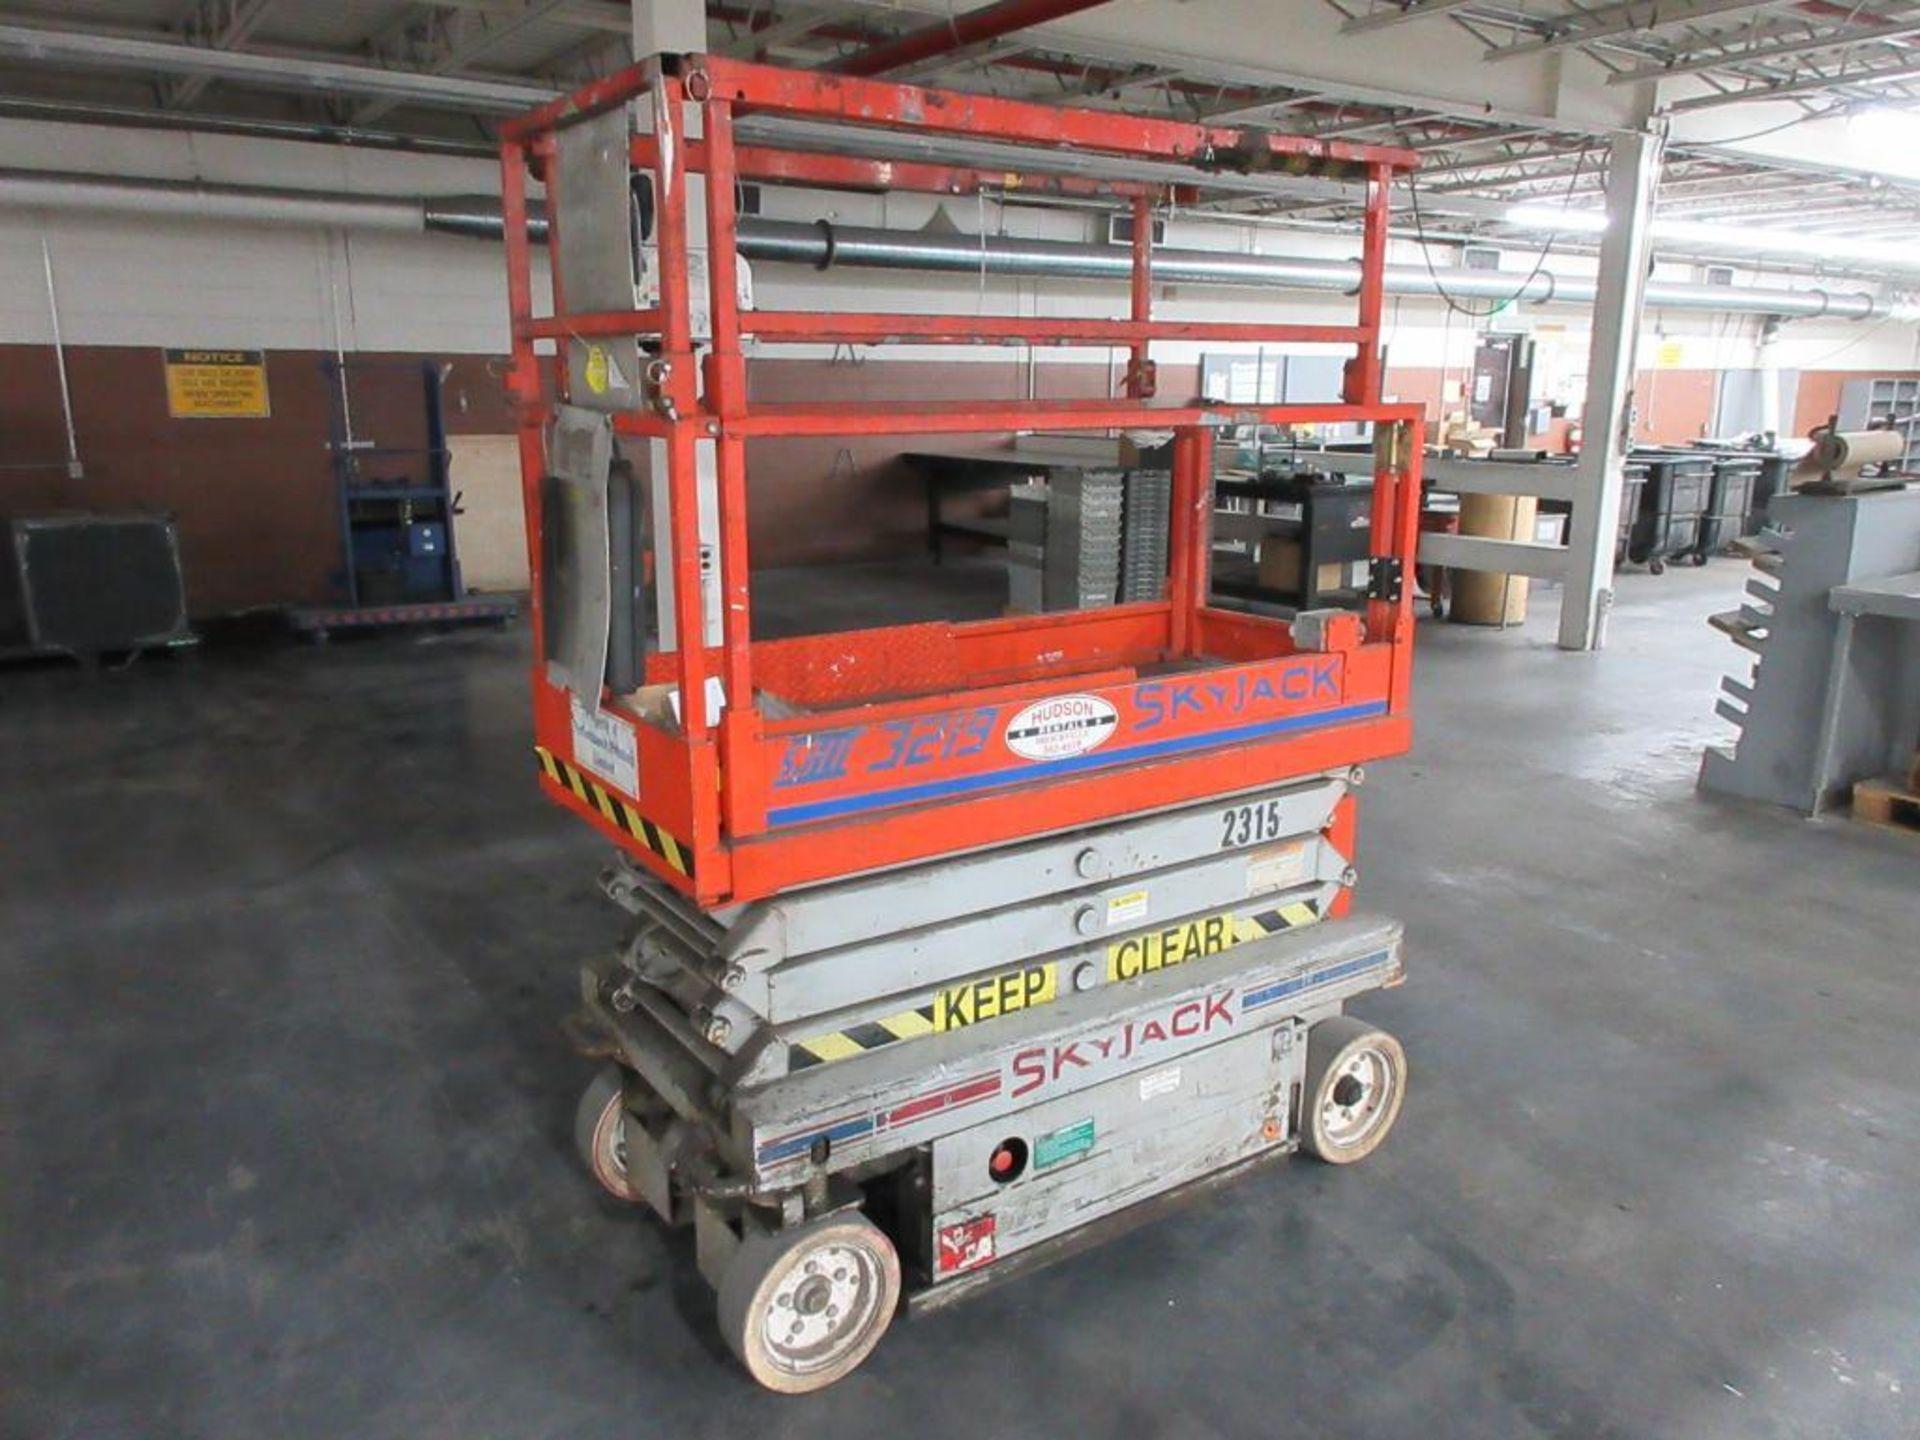 Sky Jack scissor lift model SJIII-3219, 500 lb platform capacity, sn 234112 - Image 2 of 4